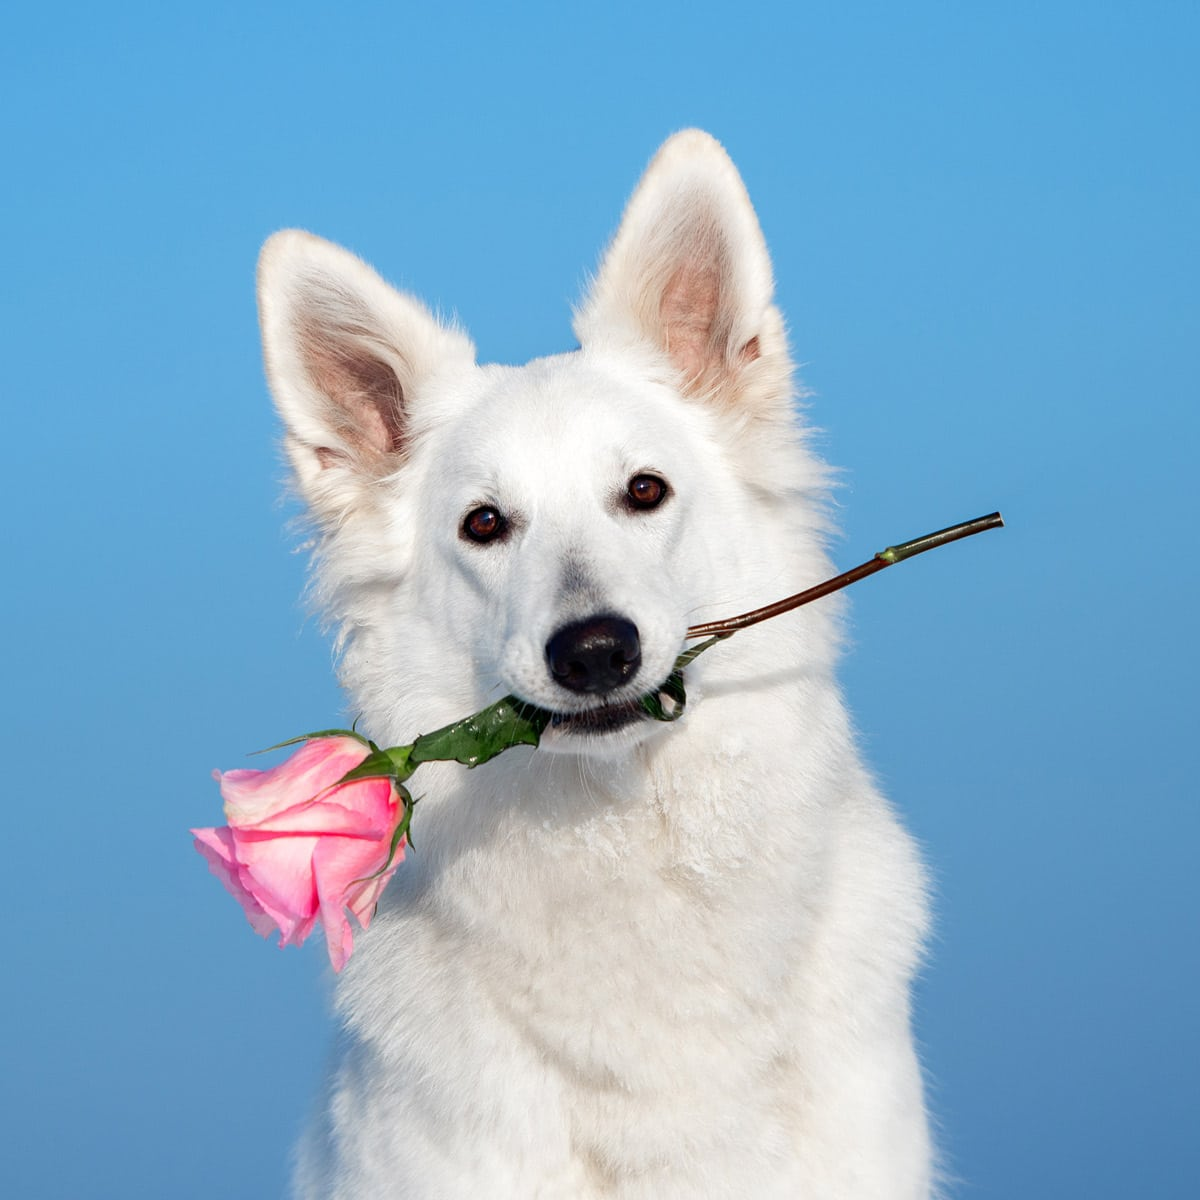 Doggy Date Night February 3 2020